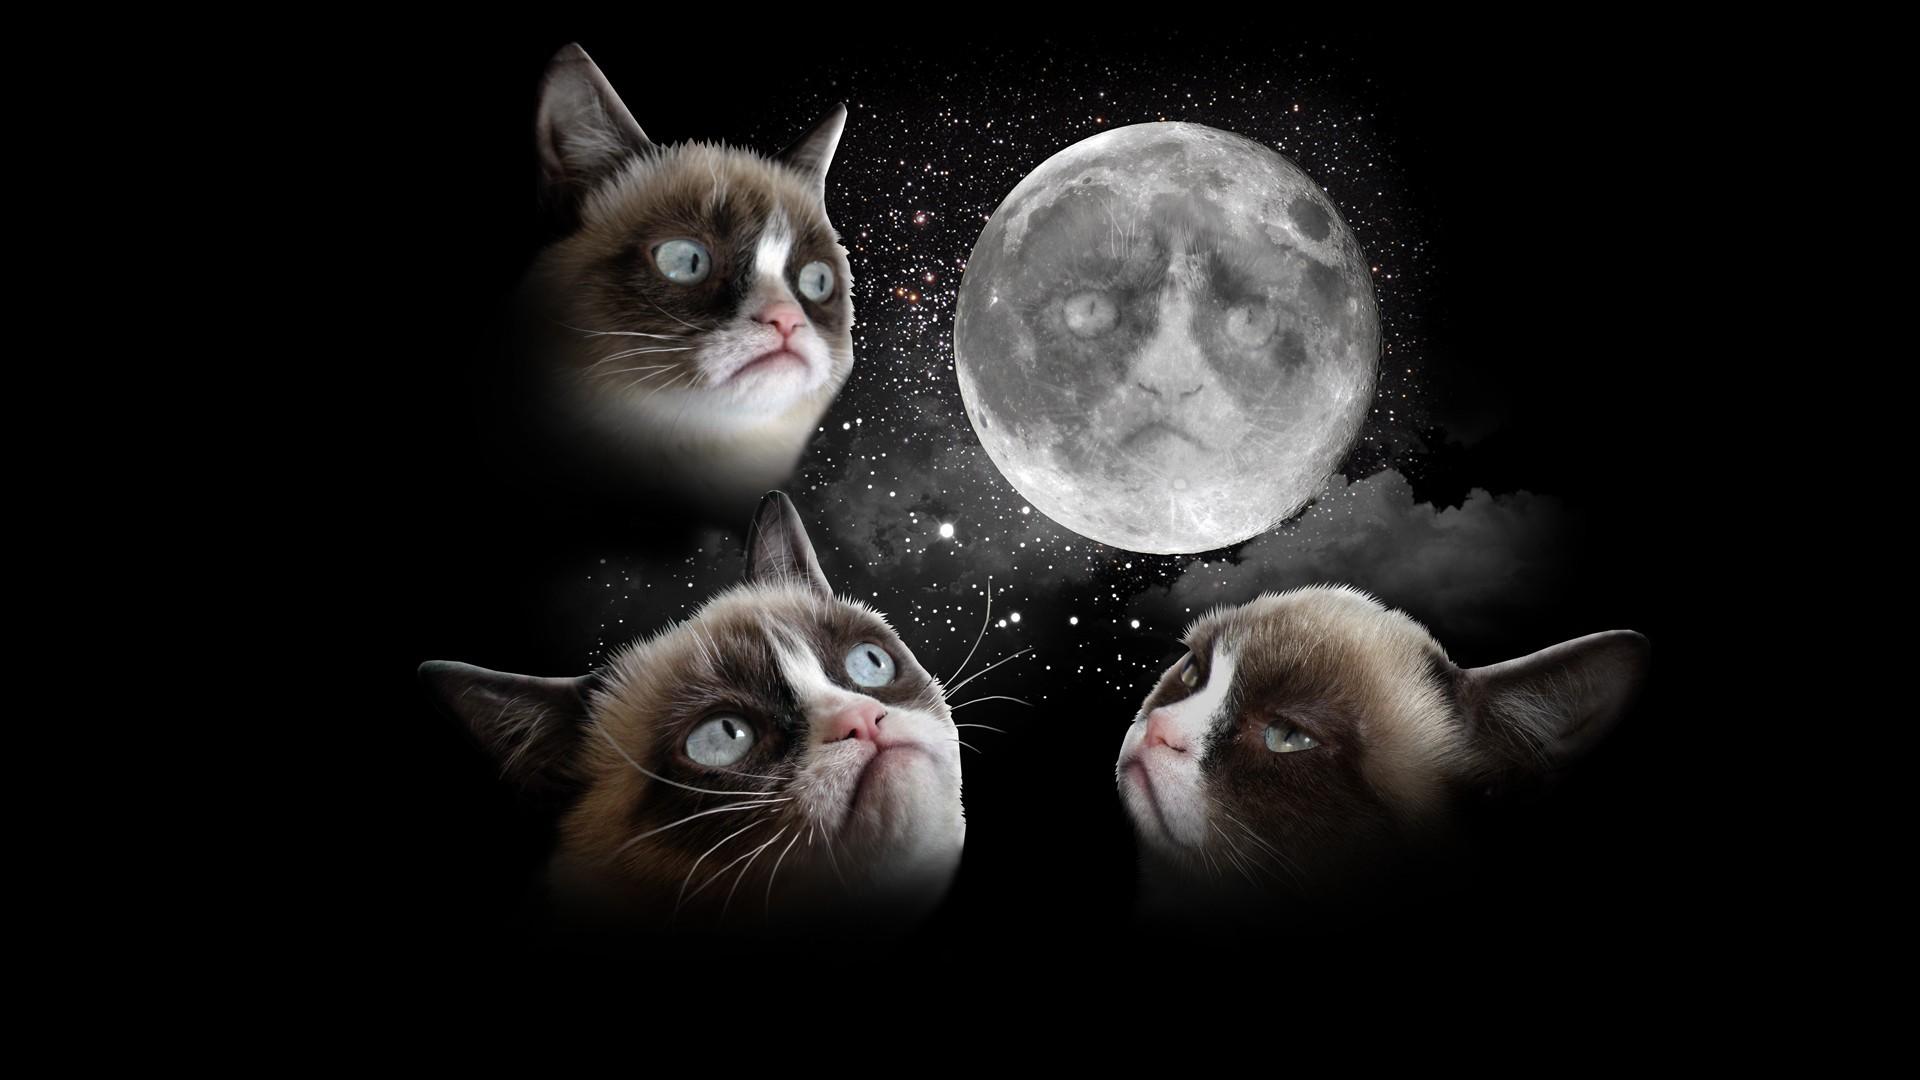 Black Grumpy Cat Pictures HD Wallpaper Black Grumpy Cat Pictures 1920x1080